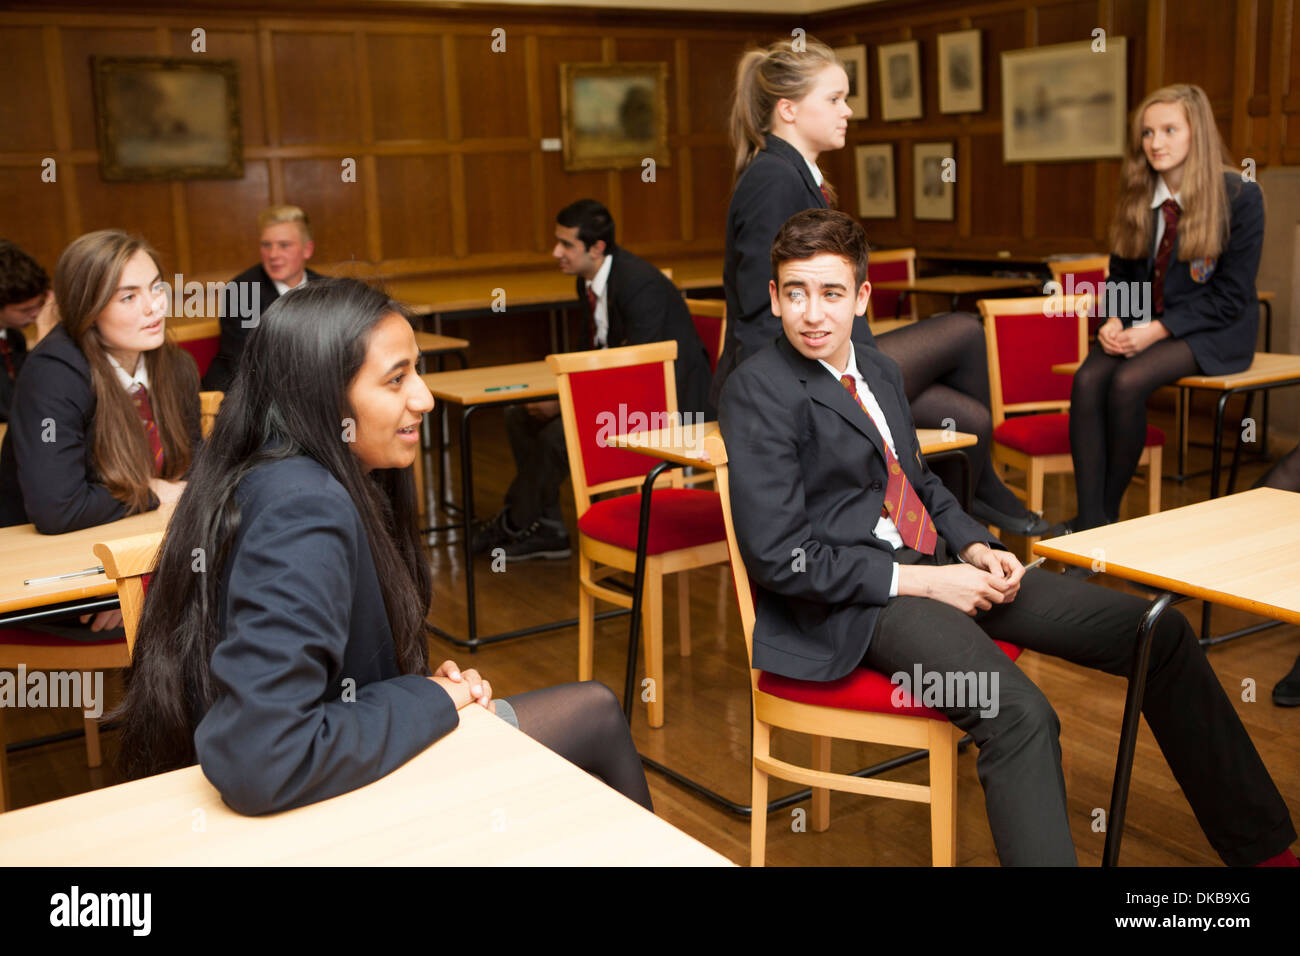 Group of  teenage schoolchildren chatting in exam class - Stock Image